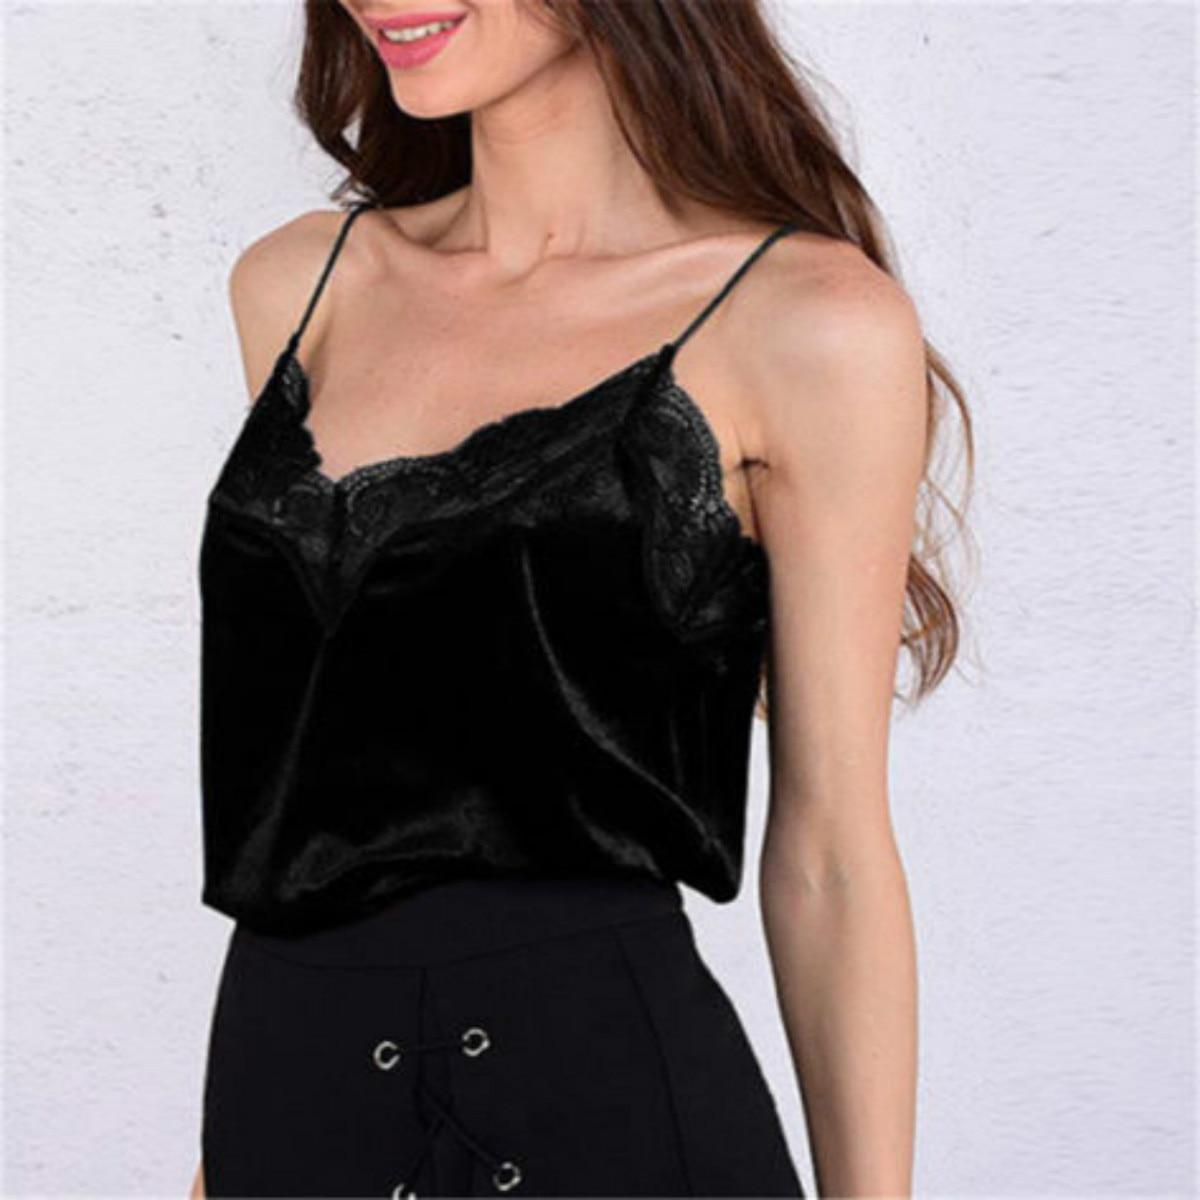 Fashion Womens Blouse V-Neck Vest Sleeveless Lace Velvet Shirt Blouse Casual Off Shoulder Tops New Hot Fashion